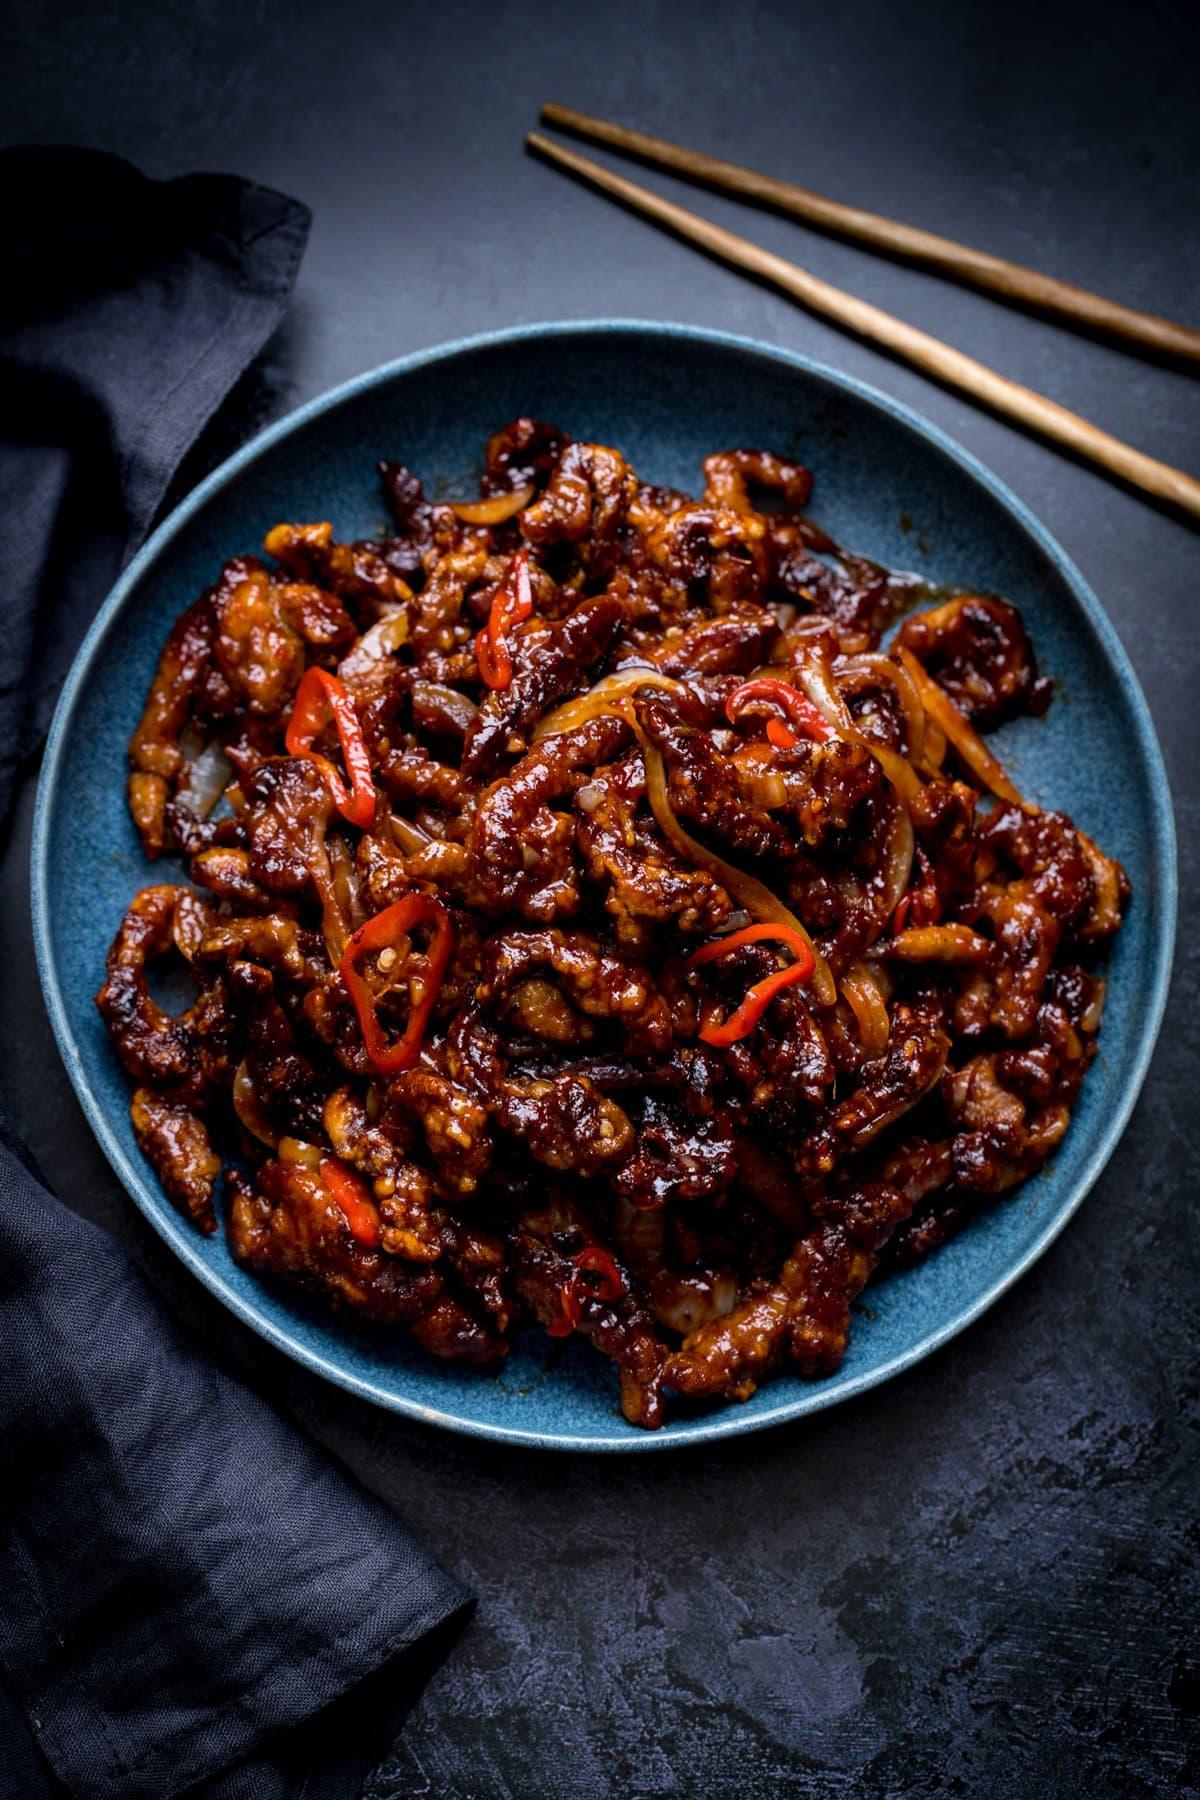 crispy chilli beef in a blue bowl on a dark background. Dark napkin and set of chopsticks also in shot.